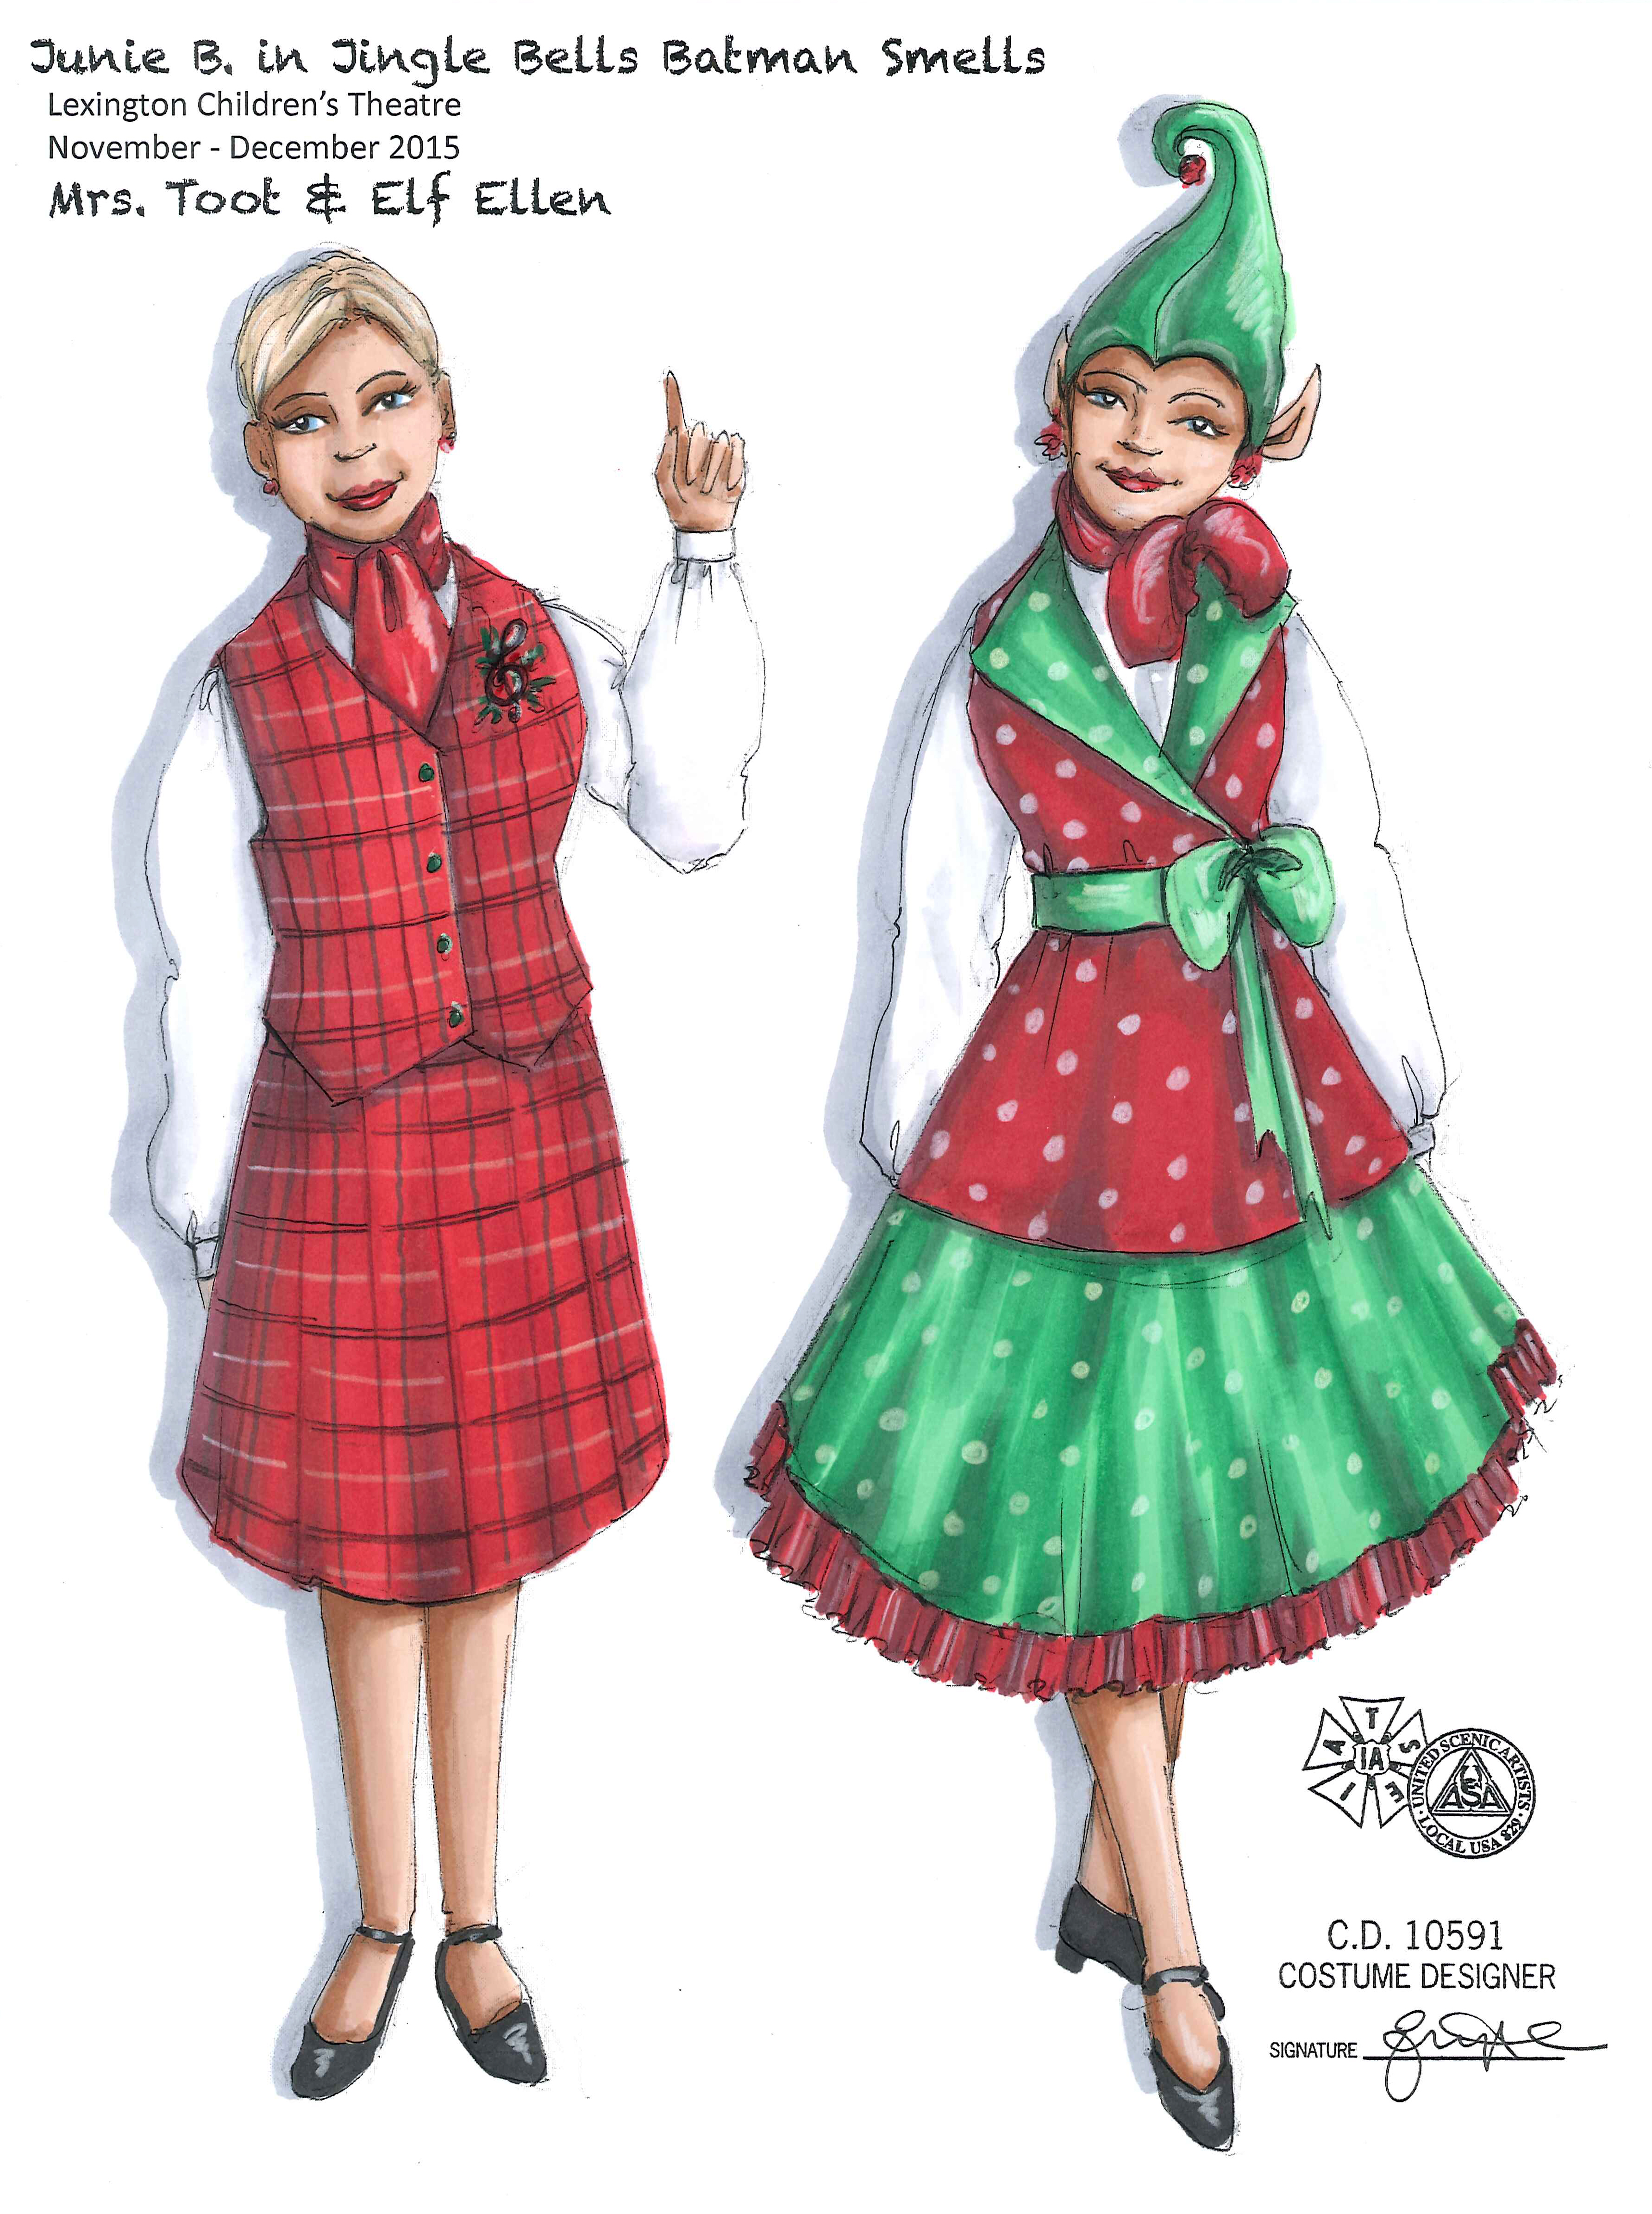 Mrs Toot & Elf Ellen from Junie B.